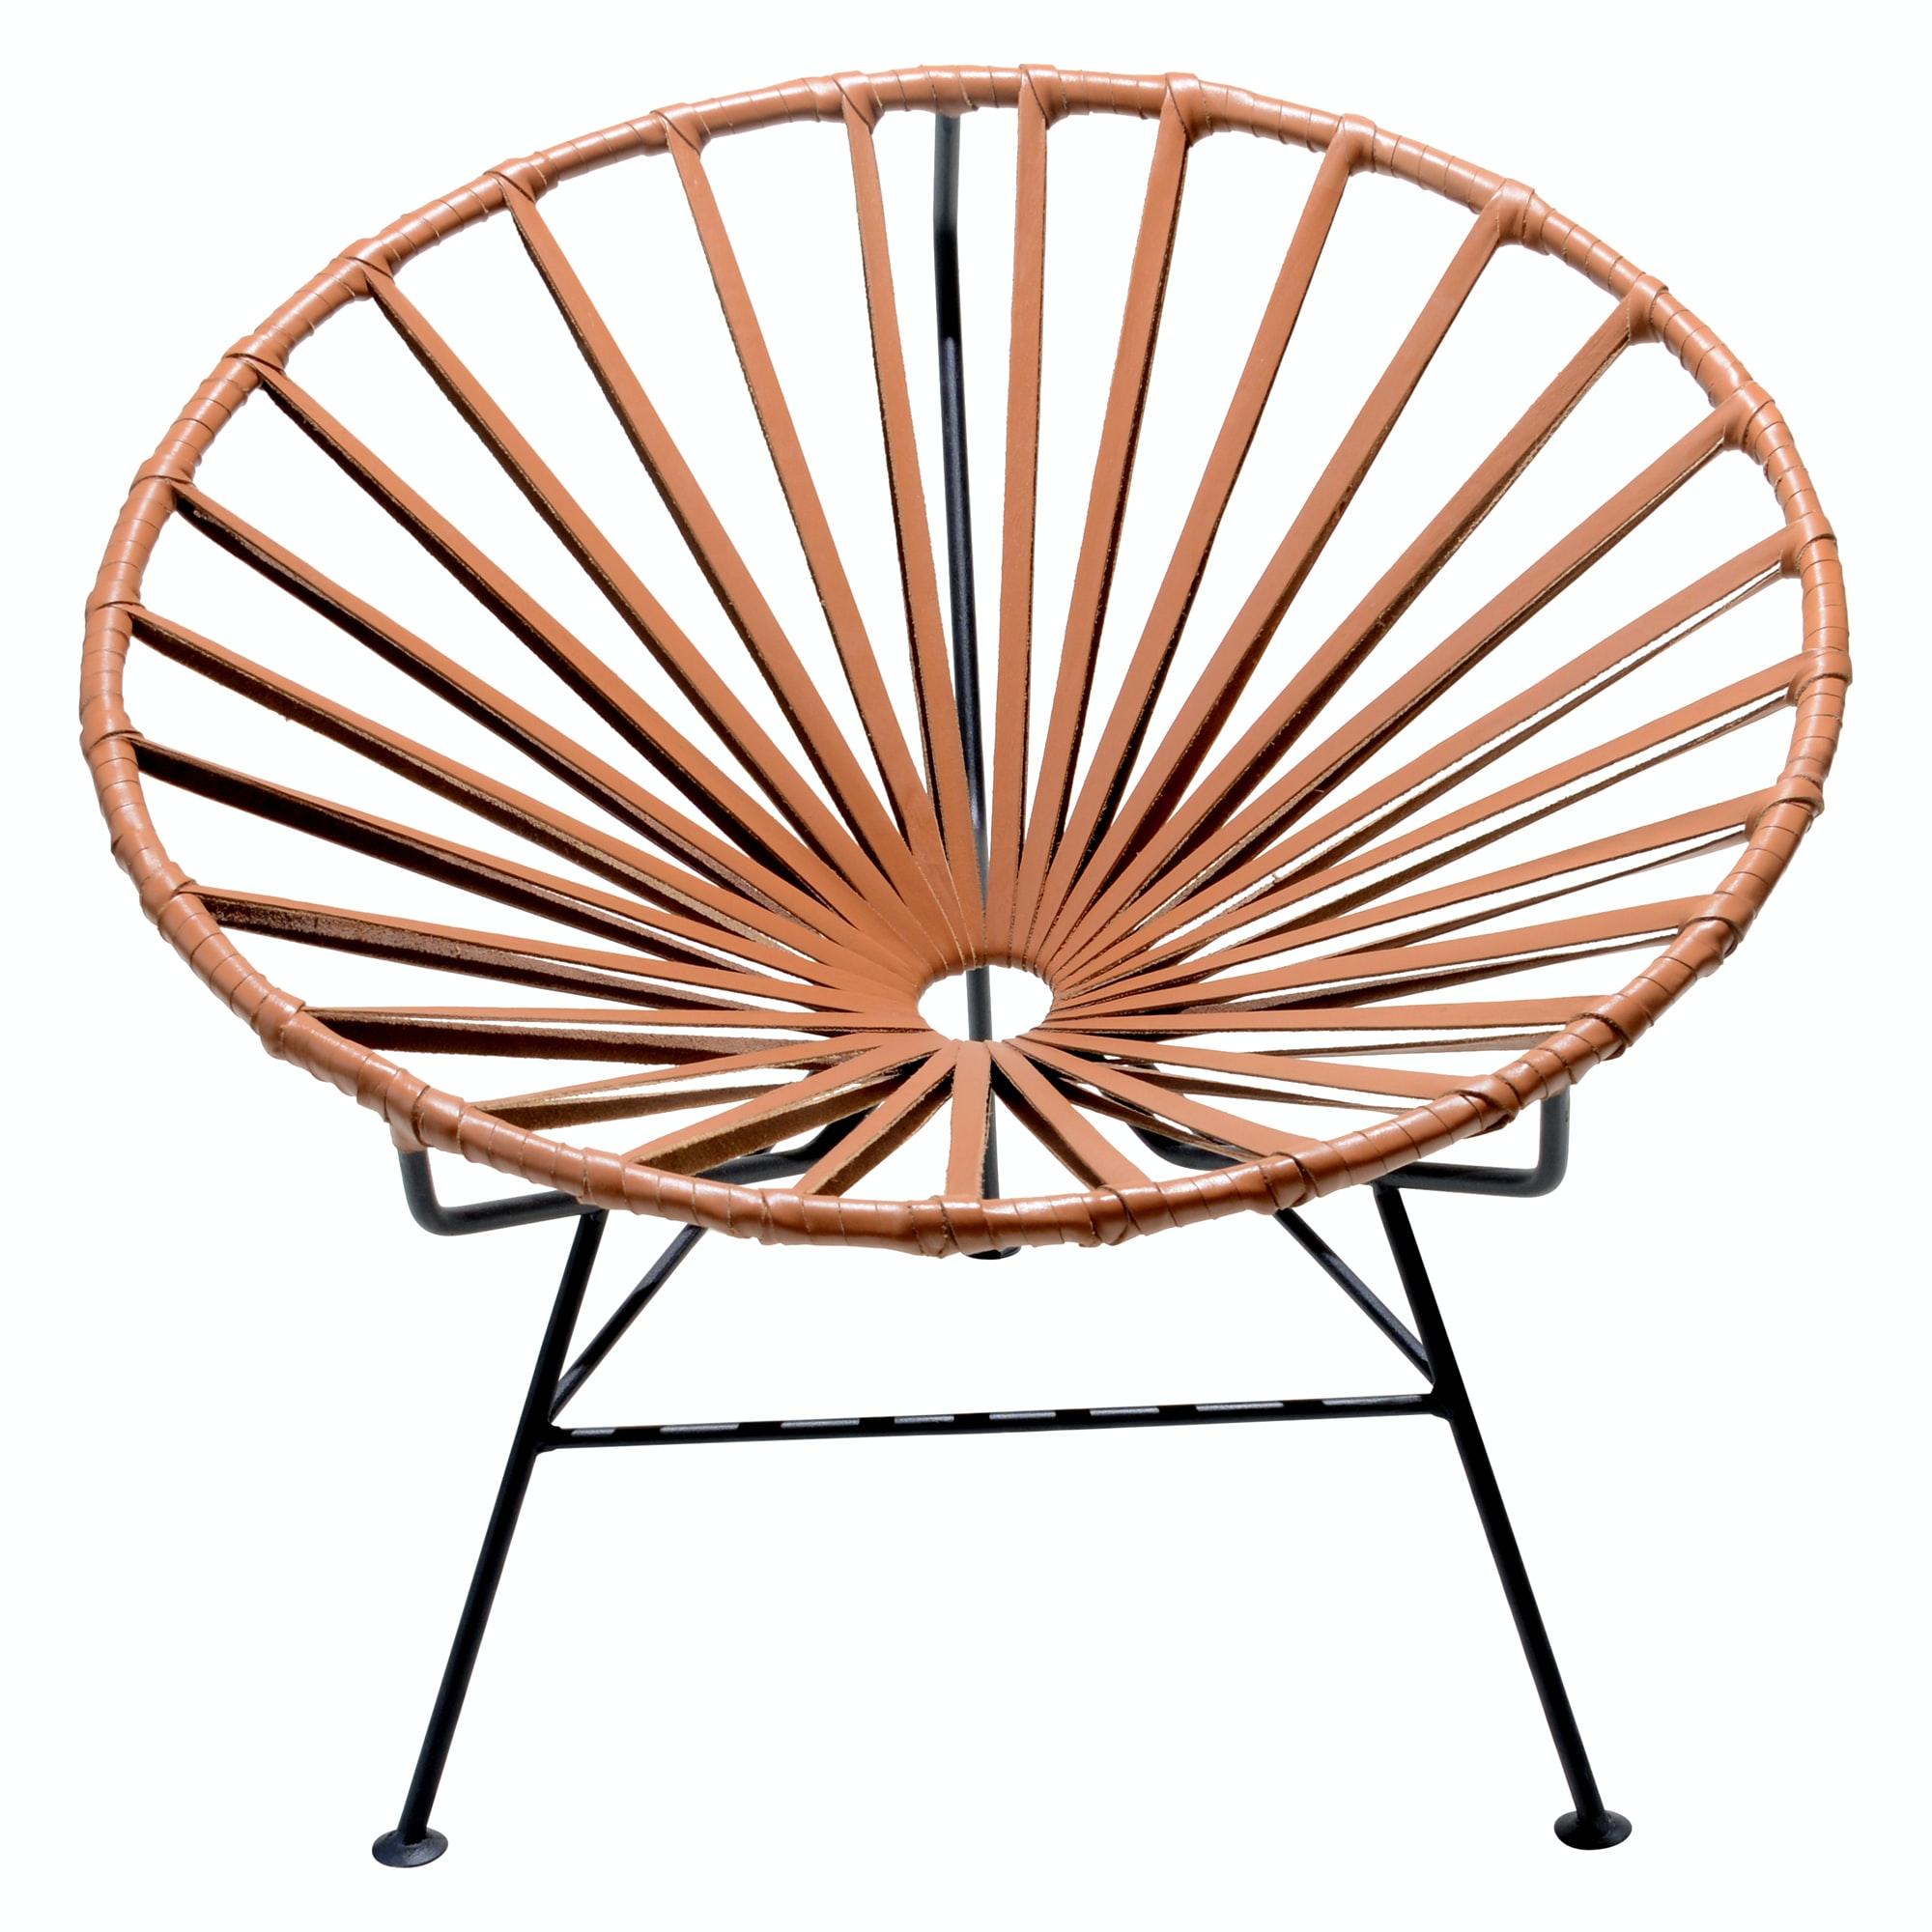 mexa sayulita leather lounge chair - Leather Lounge Chair